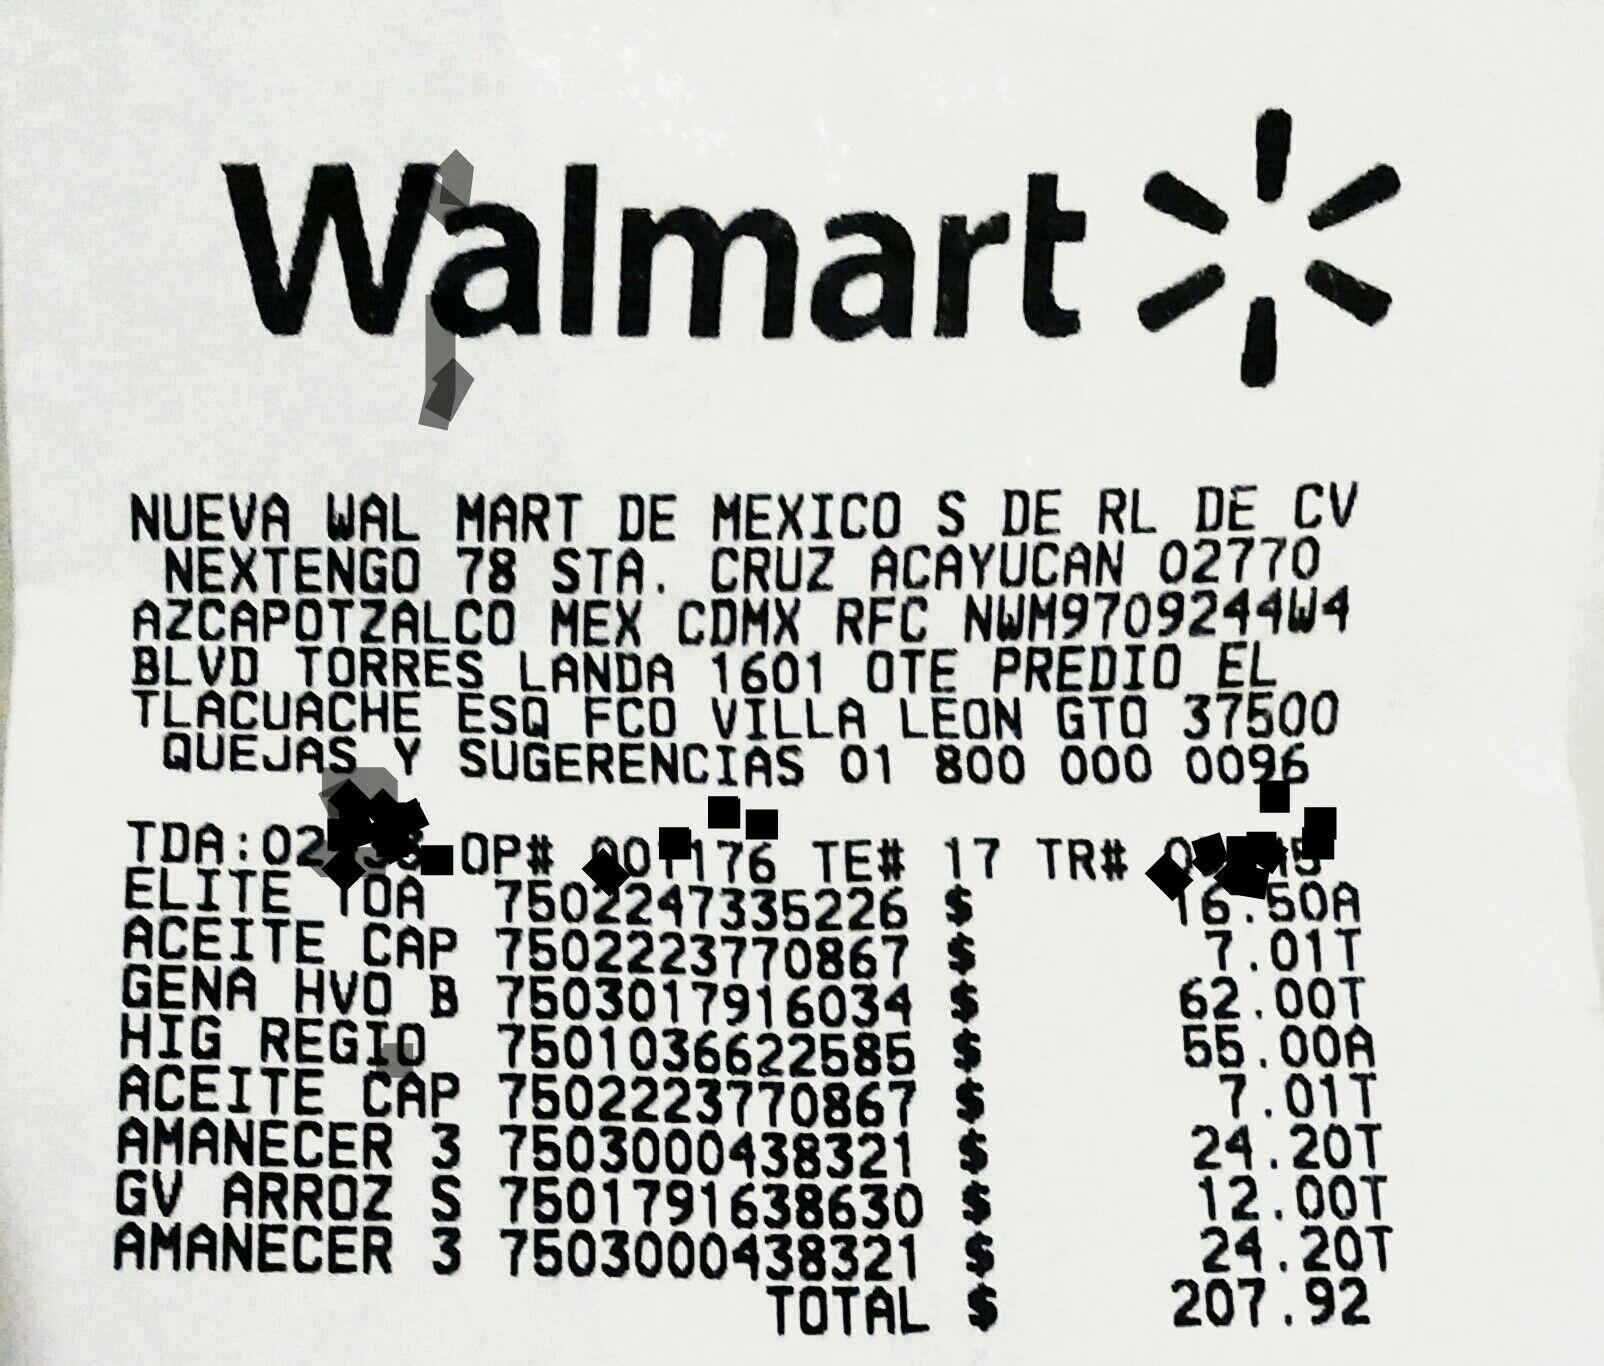 Walmart: Aceite capullo 1 Lt (León GTO)